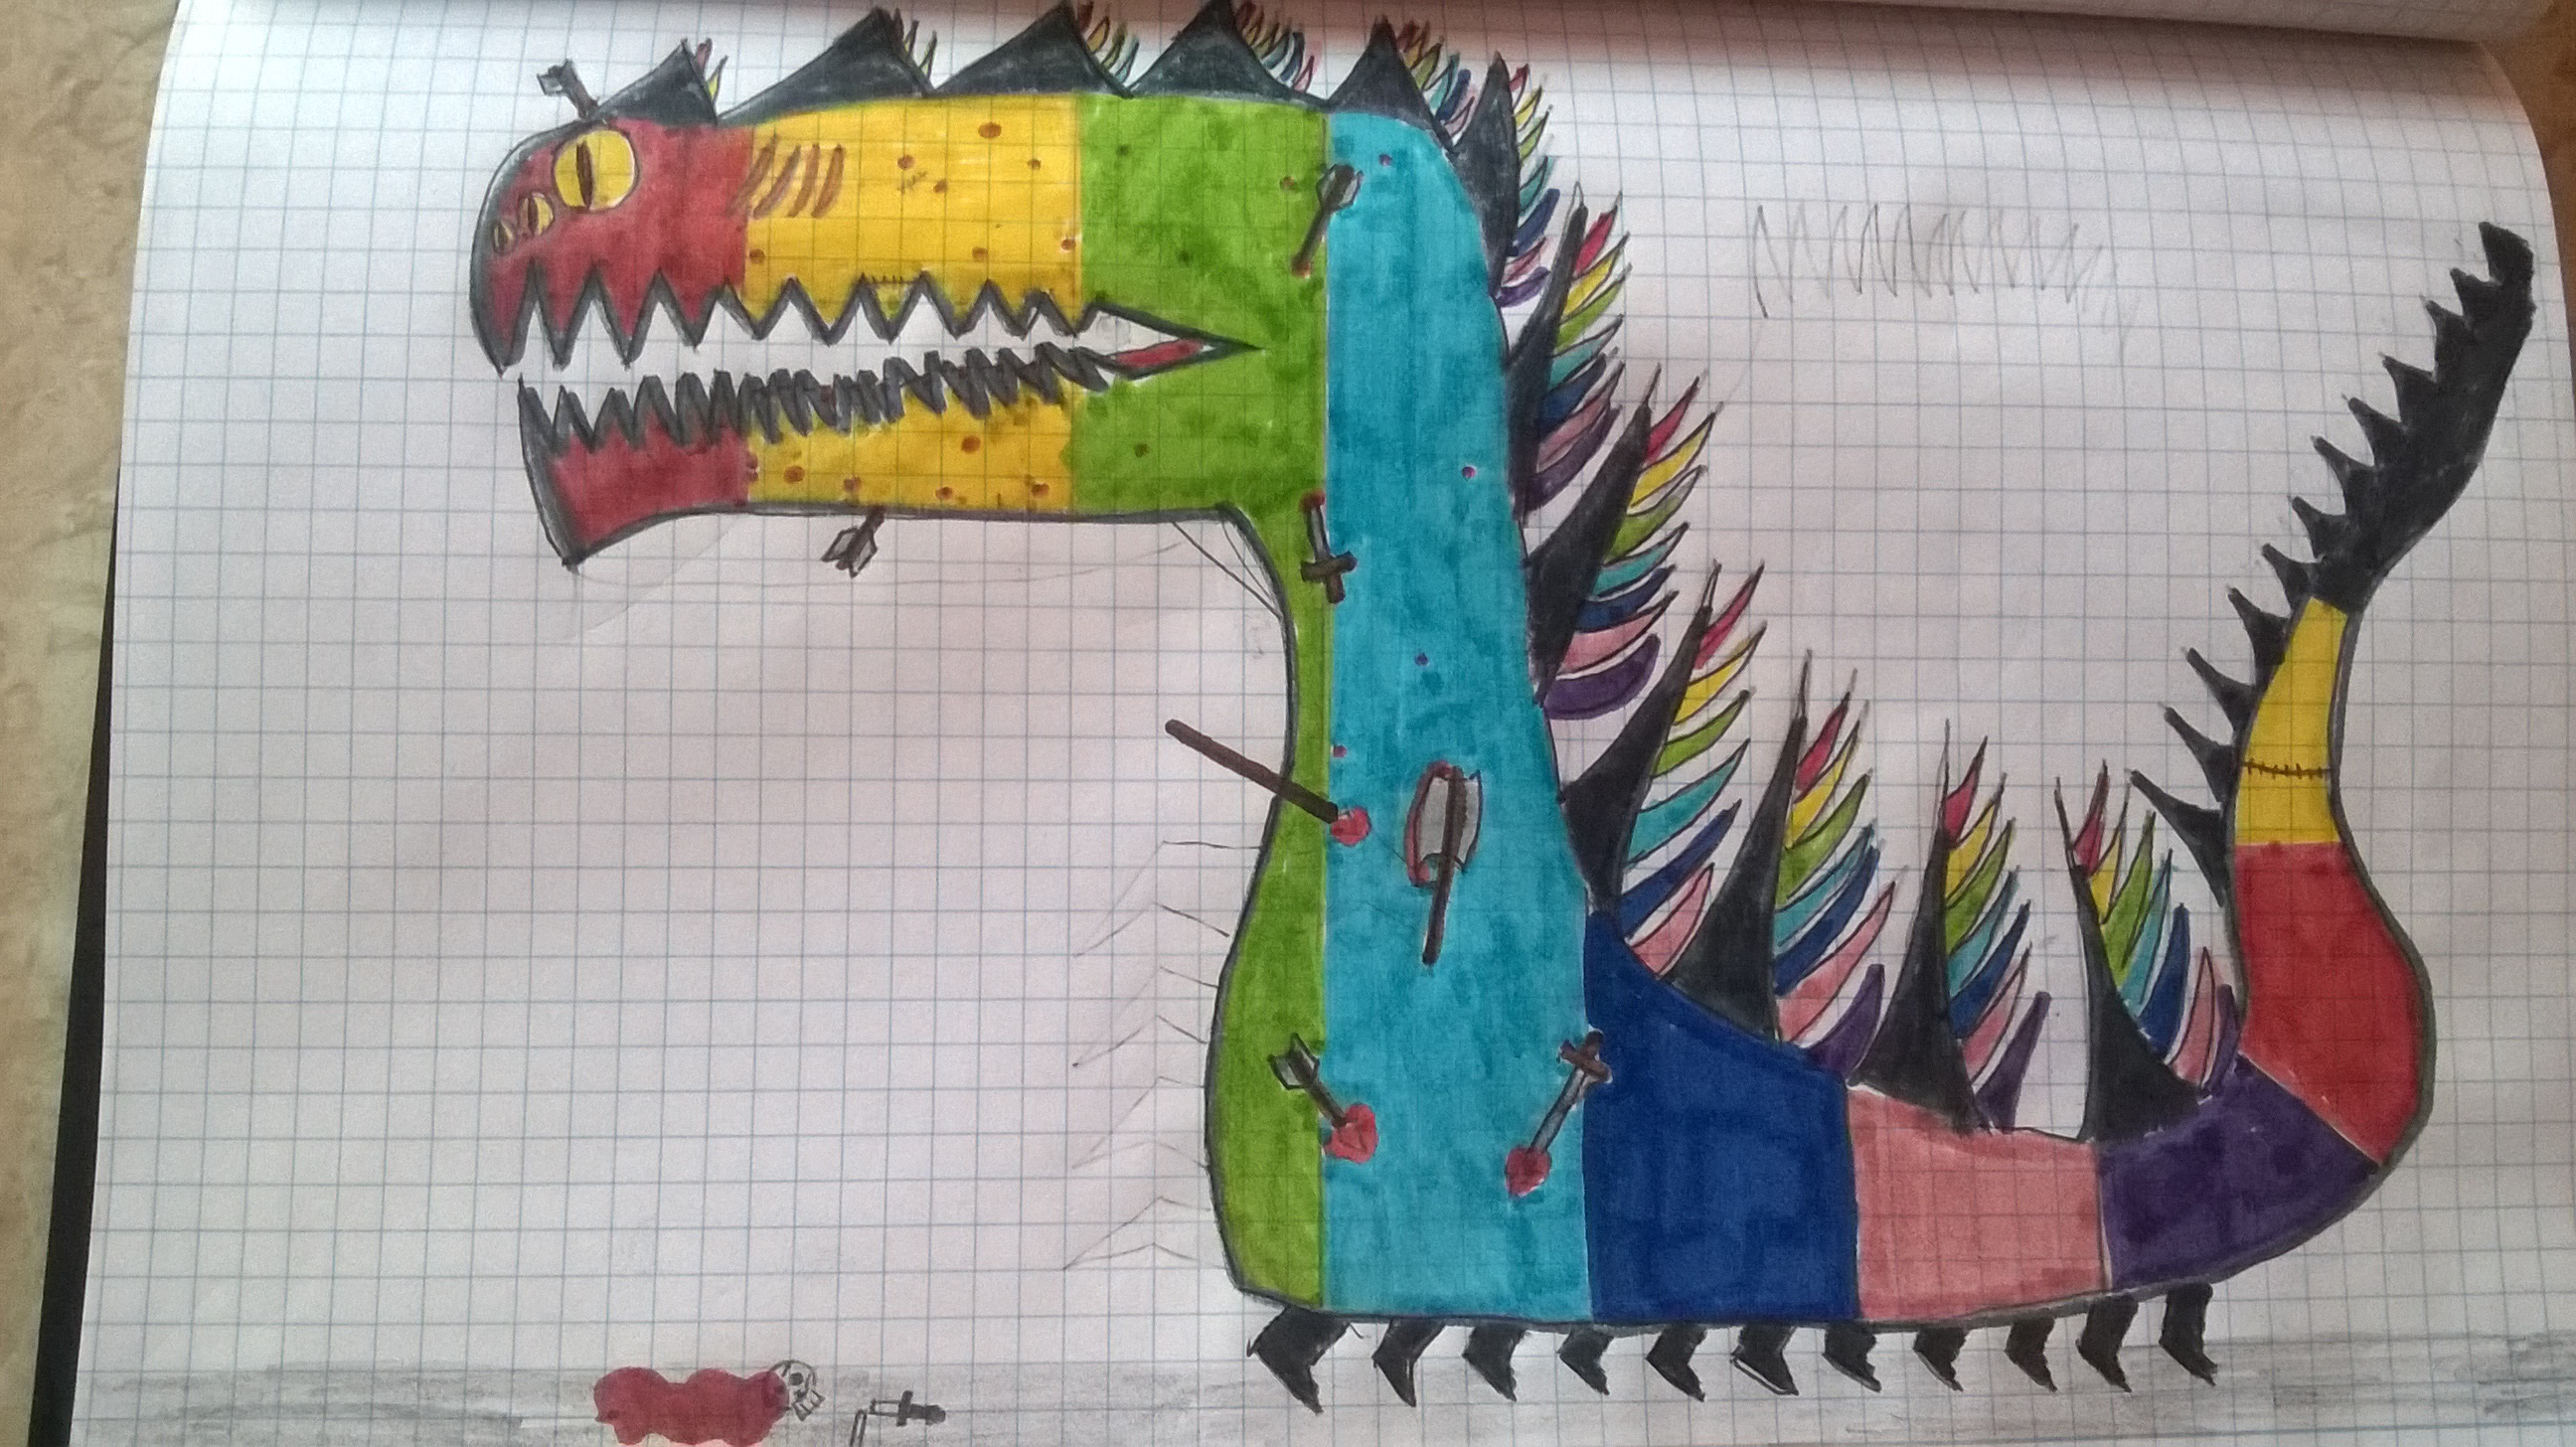 Teh Rainbow Monster